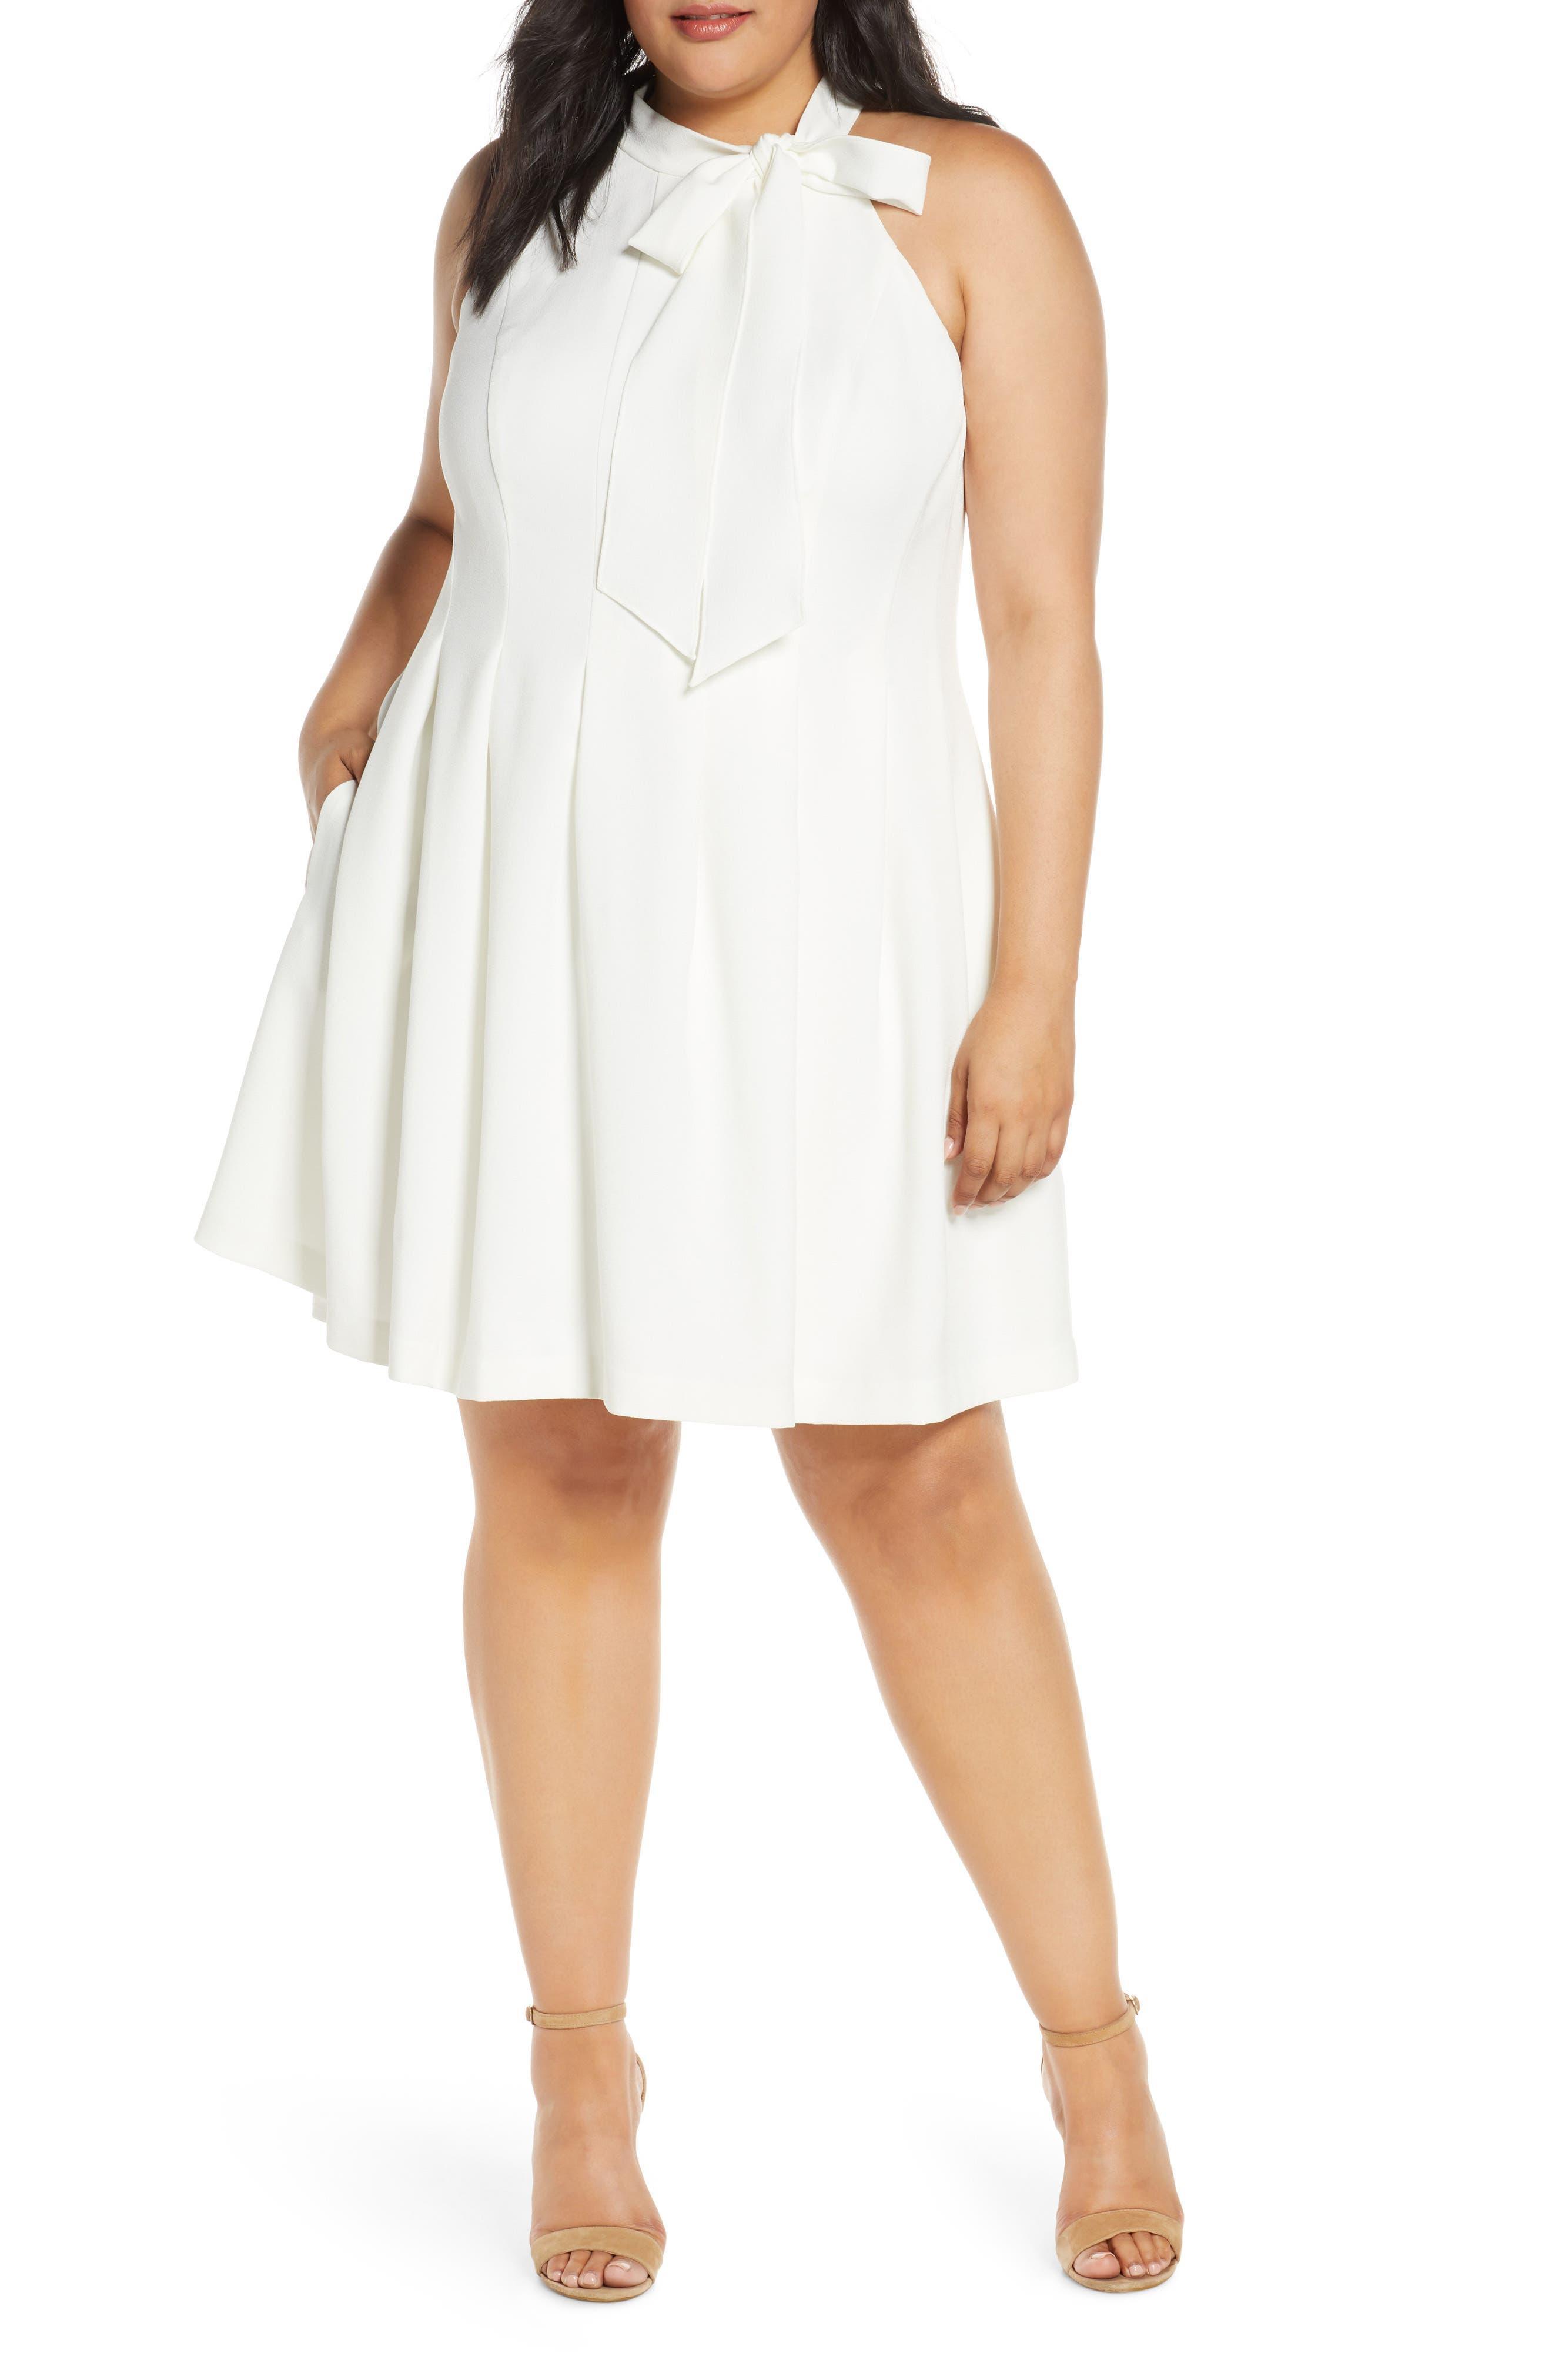 60s Wedding Dresses | 70s Wedding Dresses Plus Size Womens Vince Camuto Sleeveless Bow Fit  Flare Dress $82.80 AT vintagedancer.com